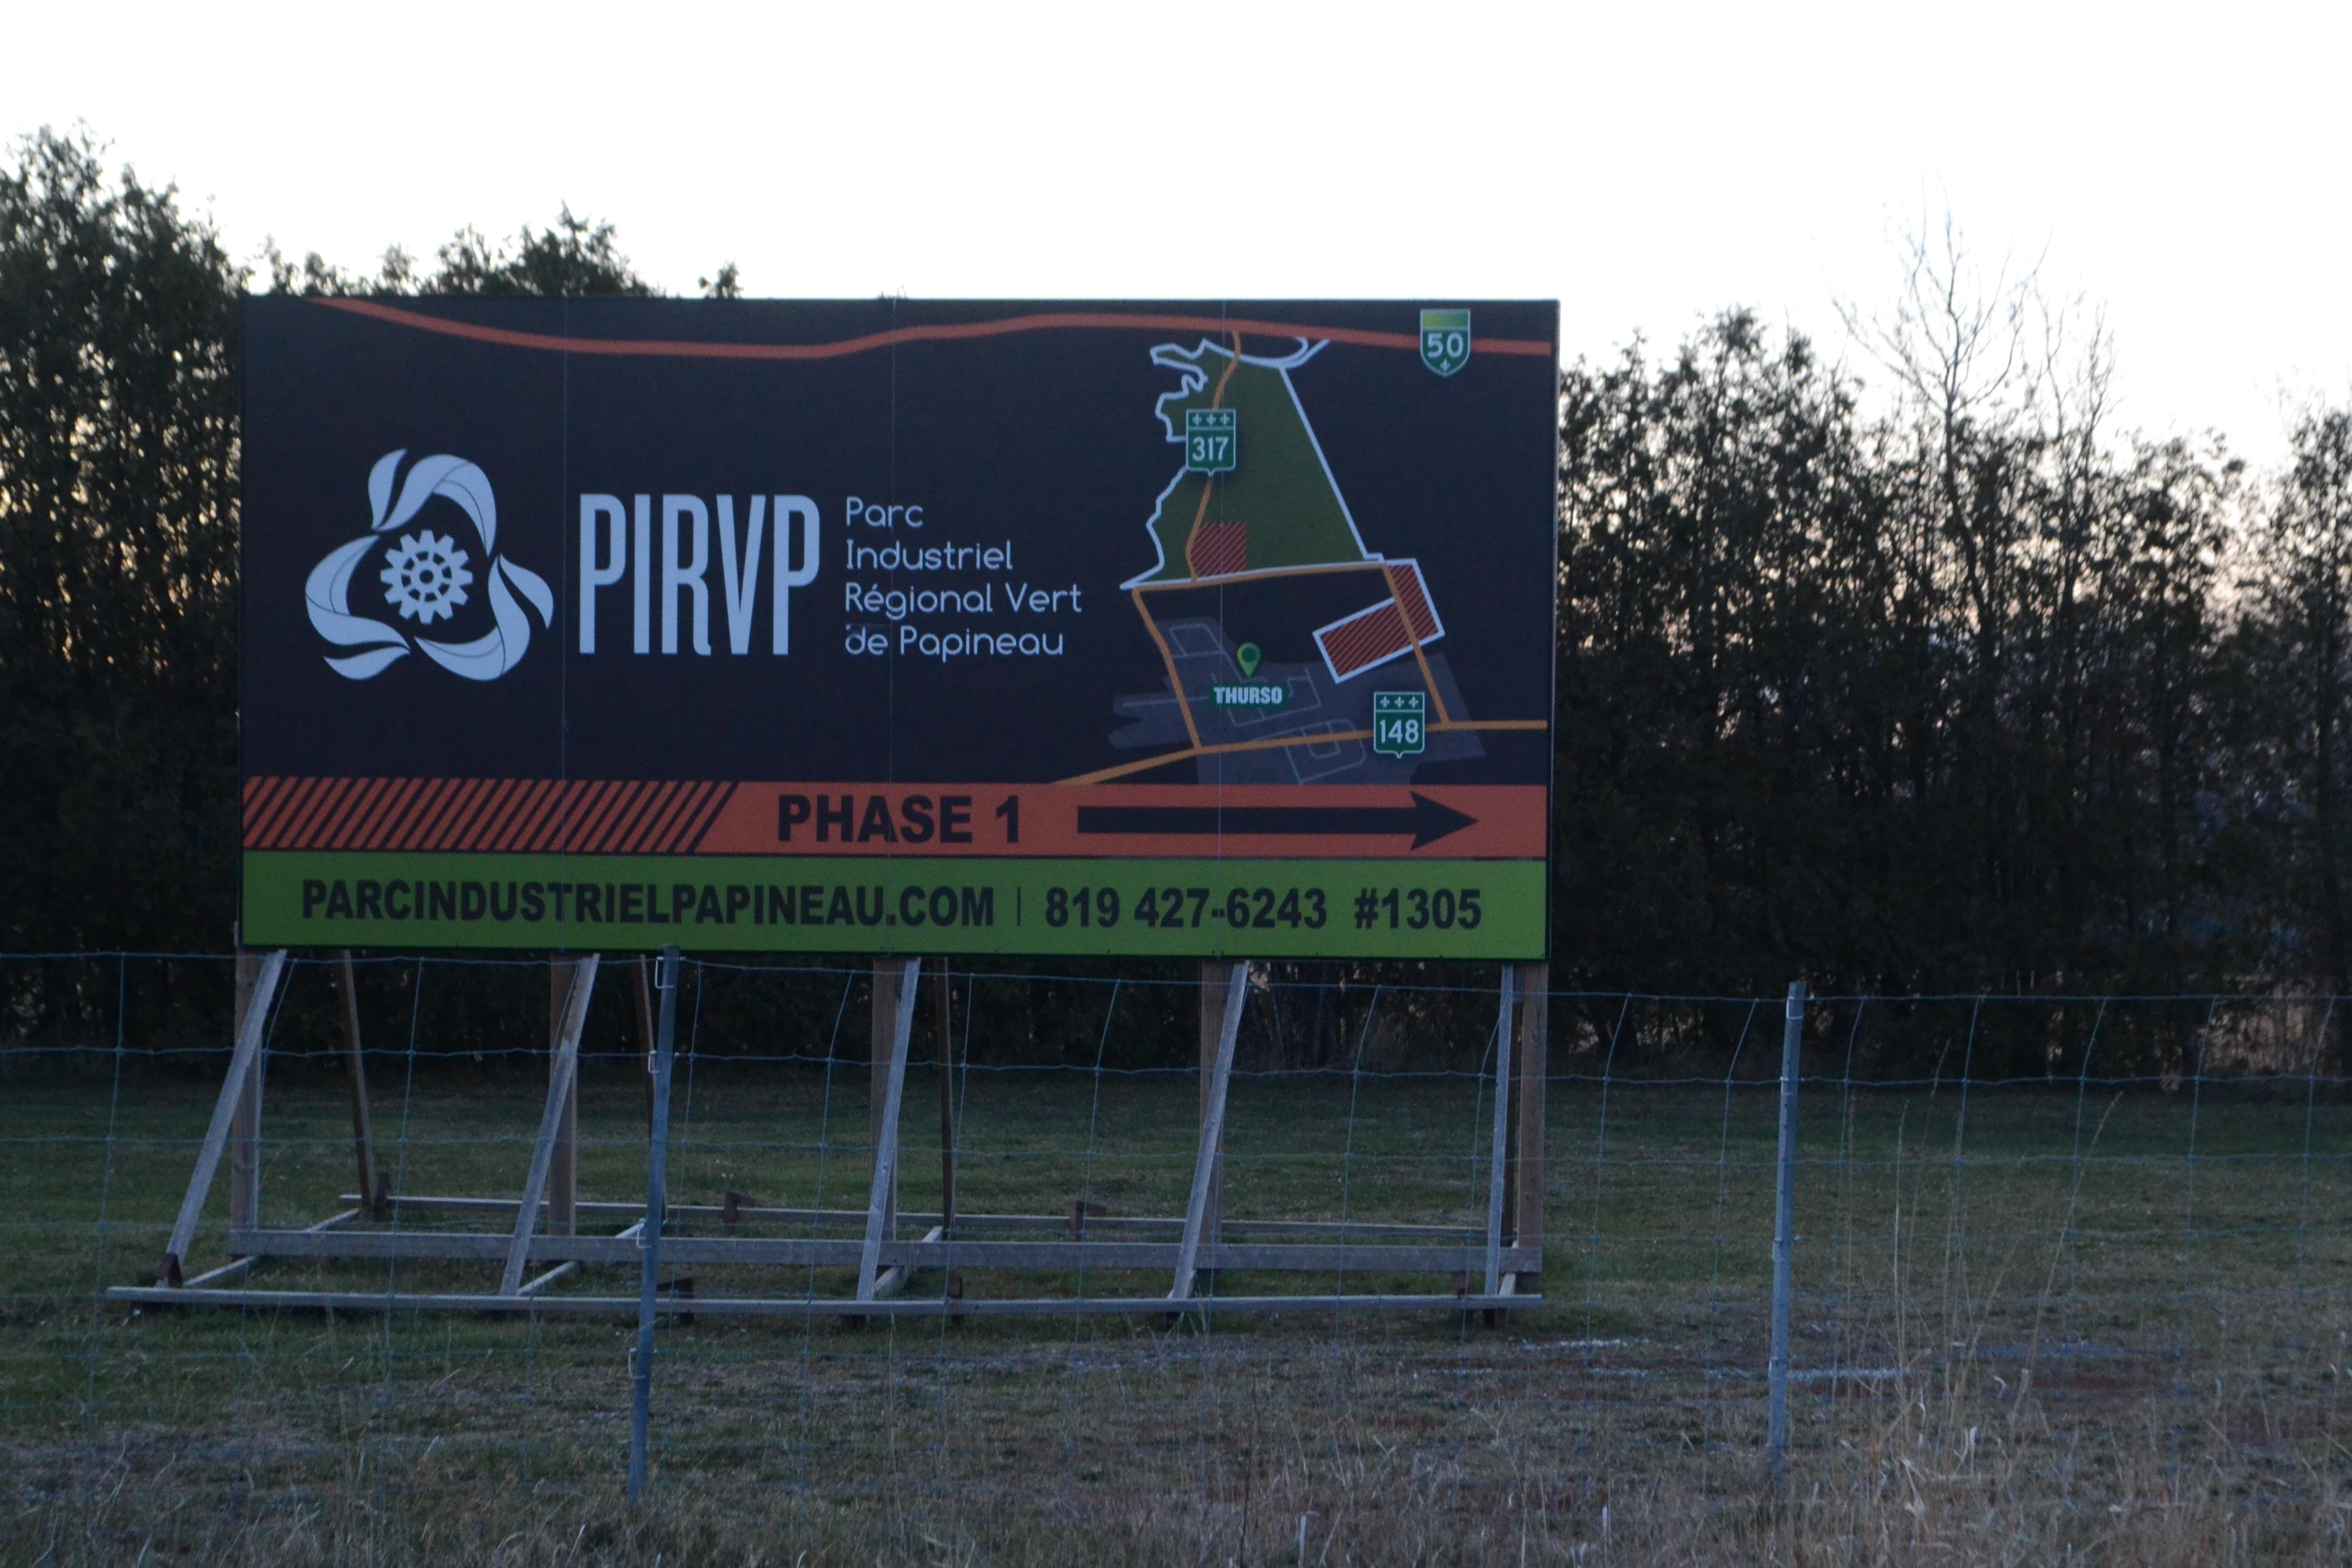 PIRVP